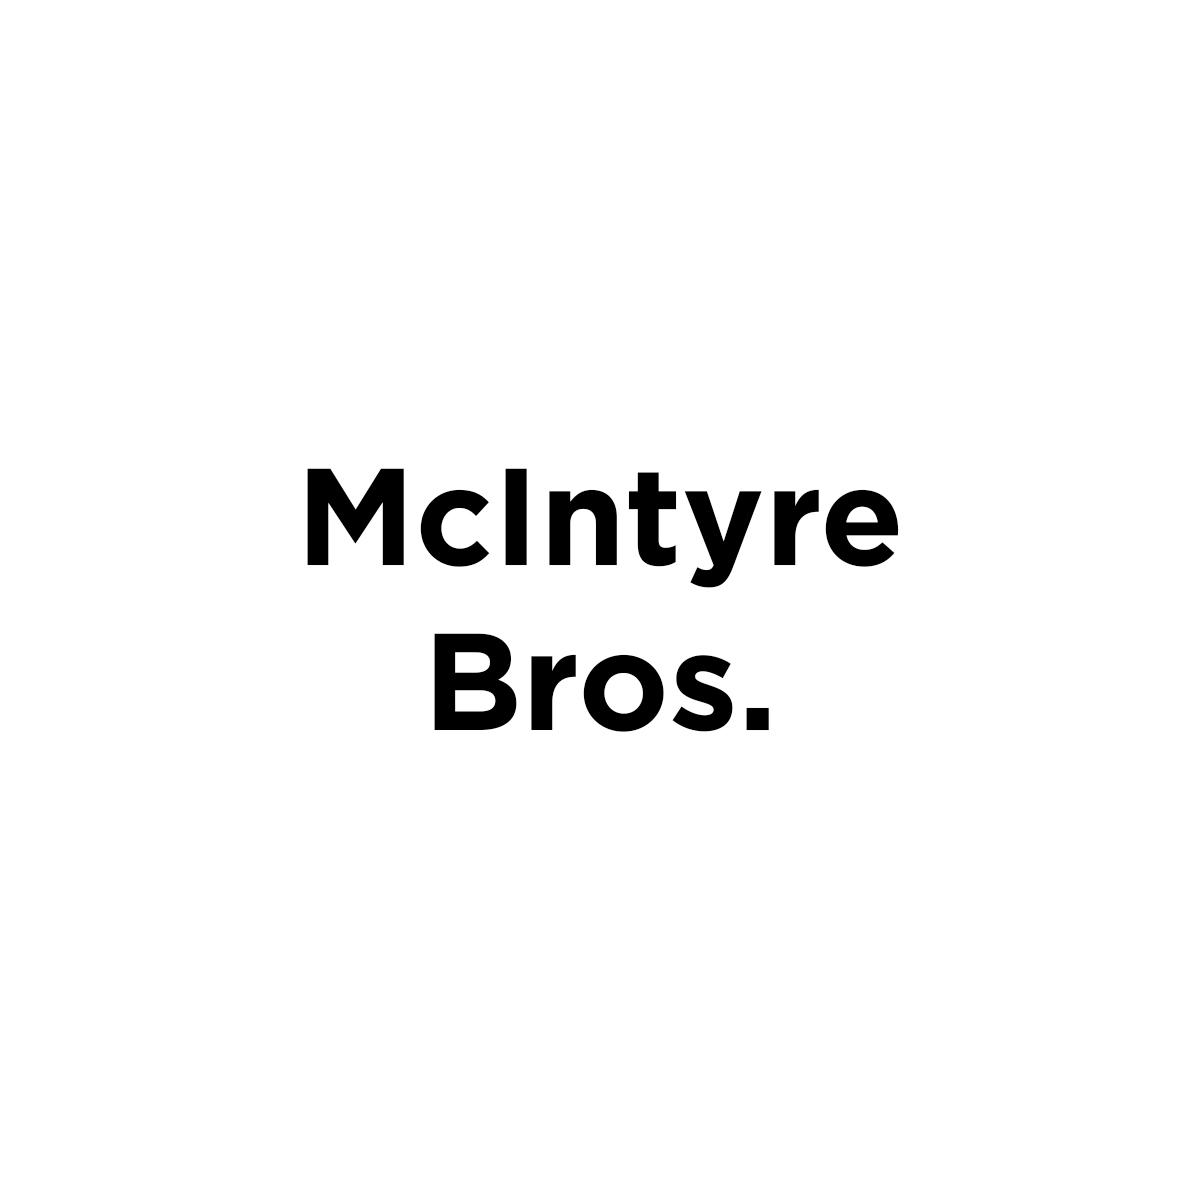 McIntyre Bros.